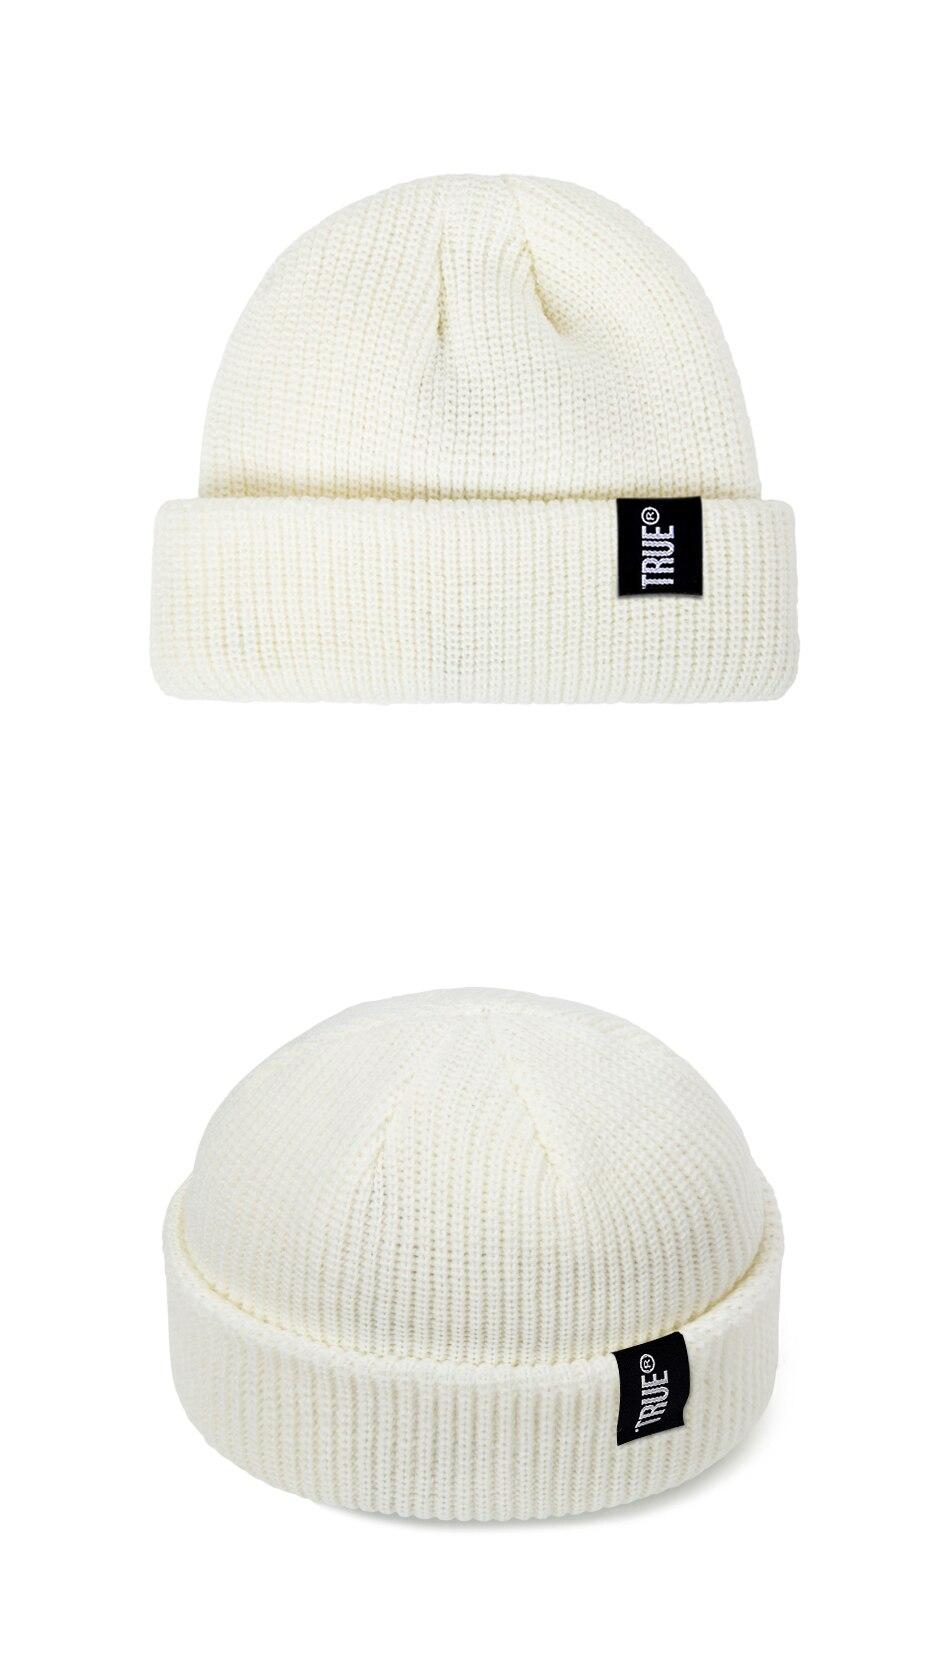 2019 Fashion Unisex Winter Hat Men Cuffed Cib Knit Hat Short Melon Ski Beanies Autumn Winter Solid Color Casual Beanie Hat 36